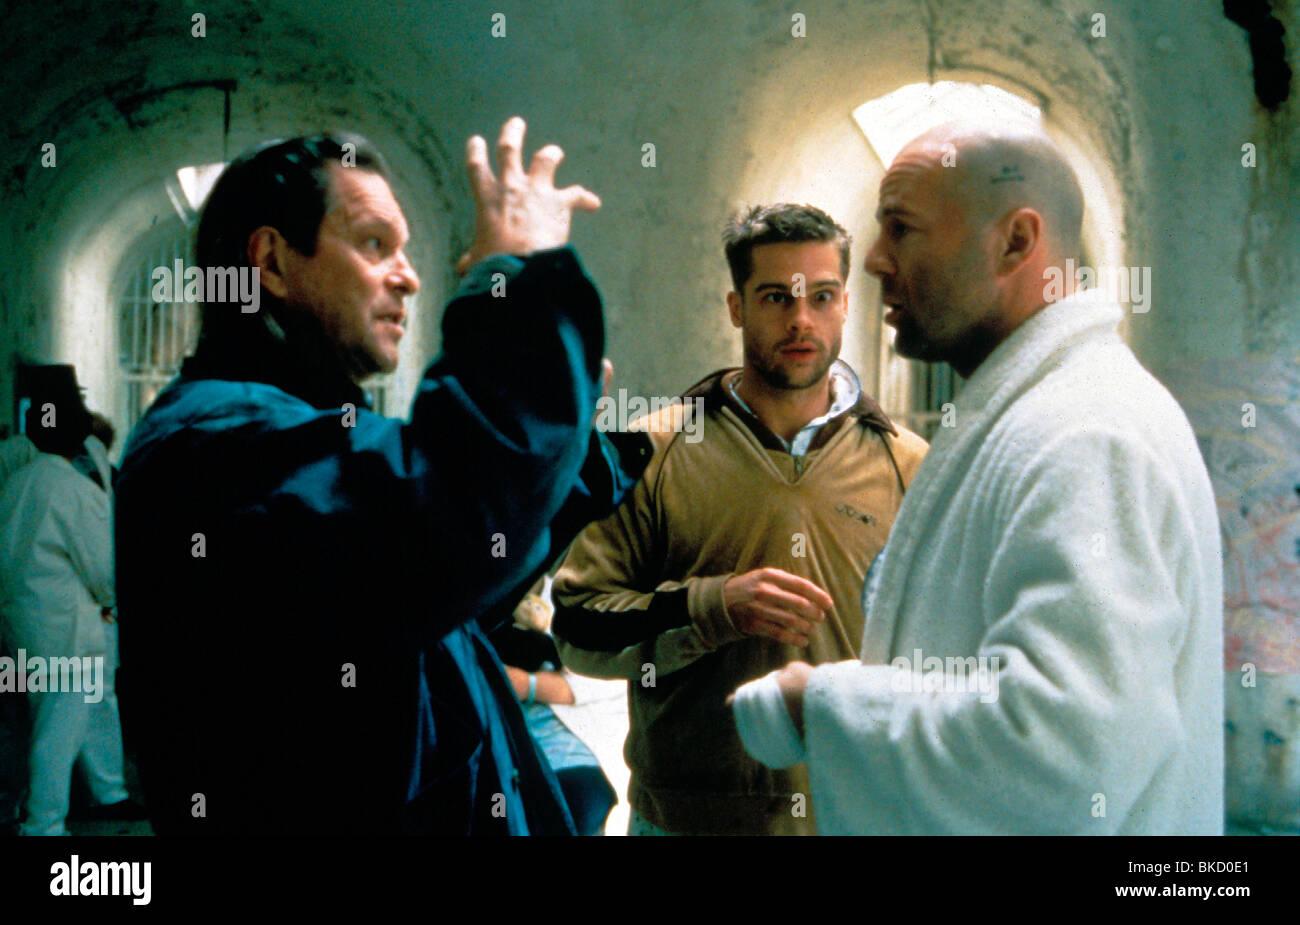 TERRY GILLIAM (DIR) O/S 'TWELVE MONKEYS' (1995) BRAD PITT, BRUCE WILLIS TYGM 002 - Stock Image